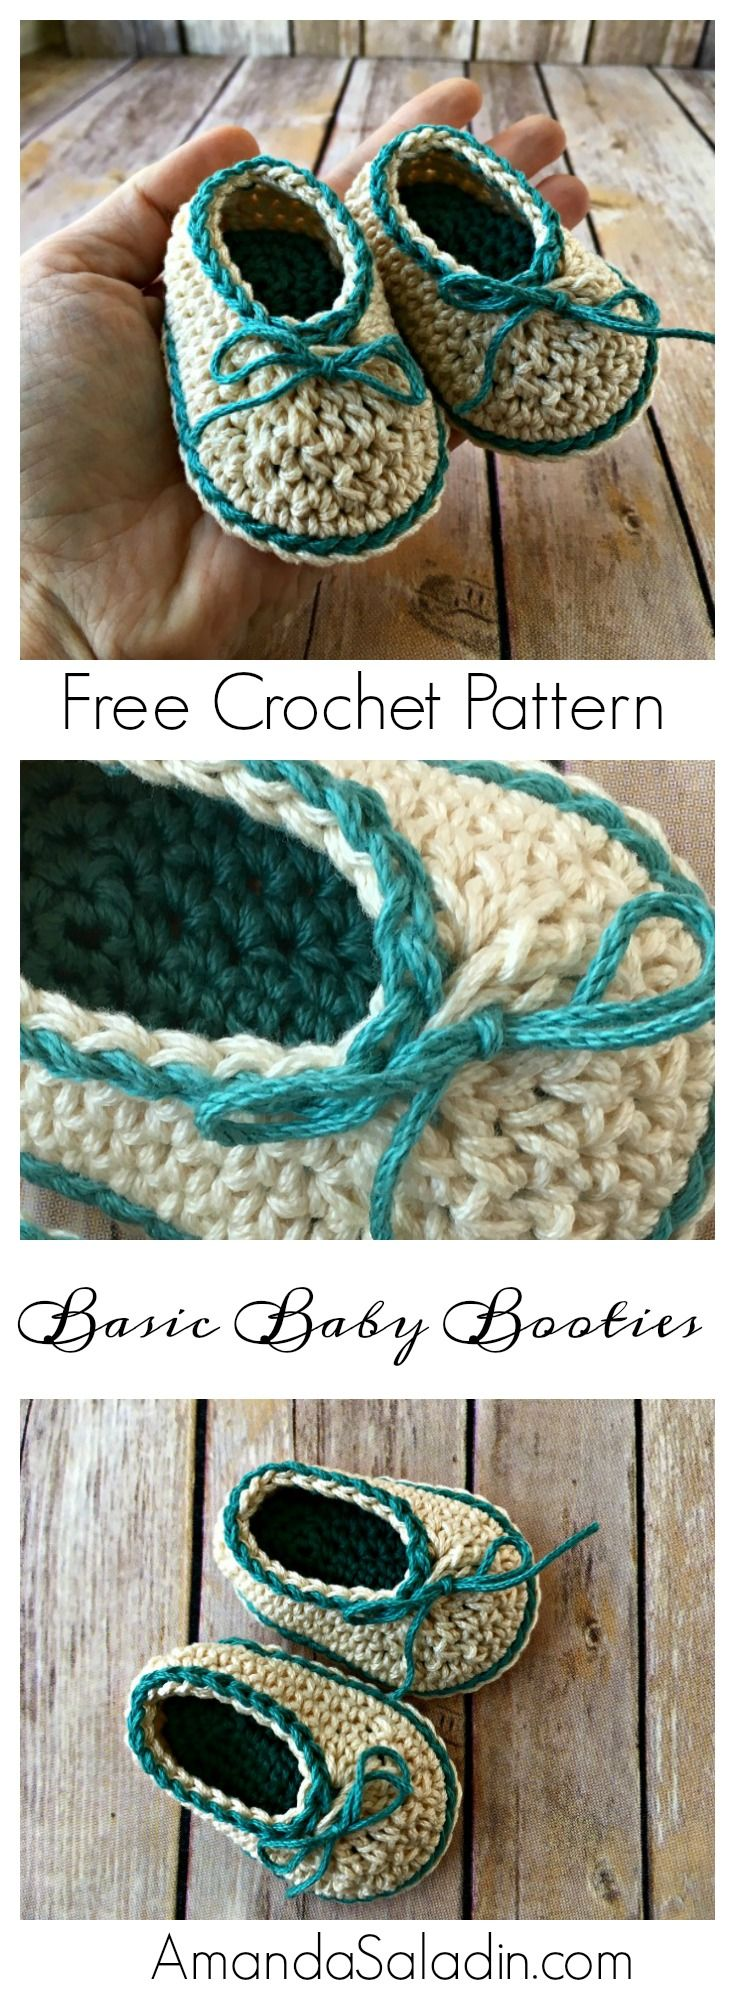 Basic Baby Booties - Free Crochet Pattern | Lana, Tejido y Bebe